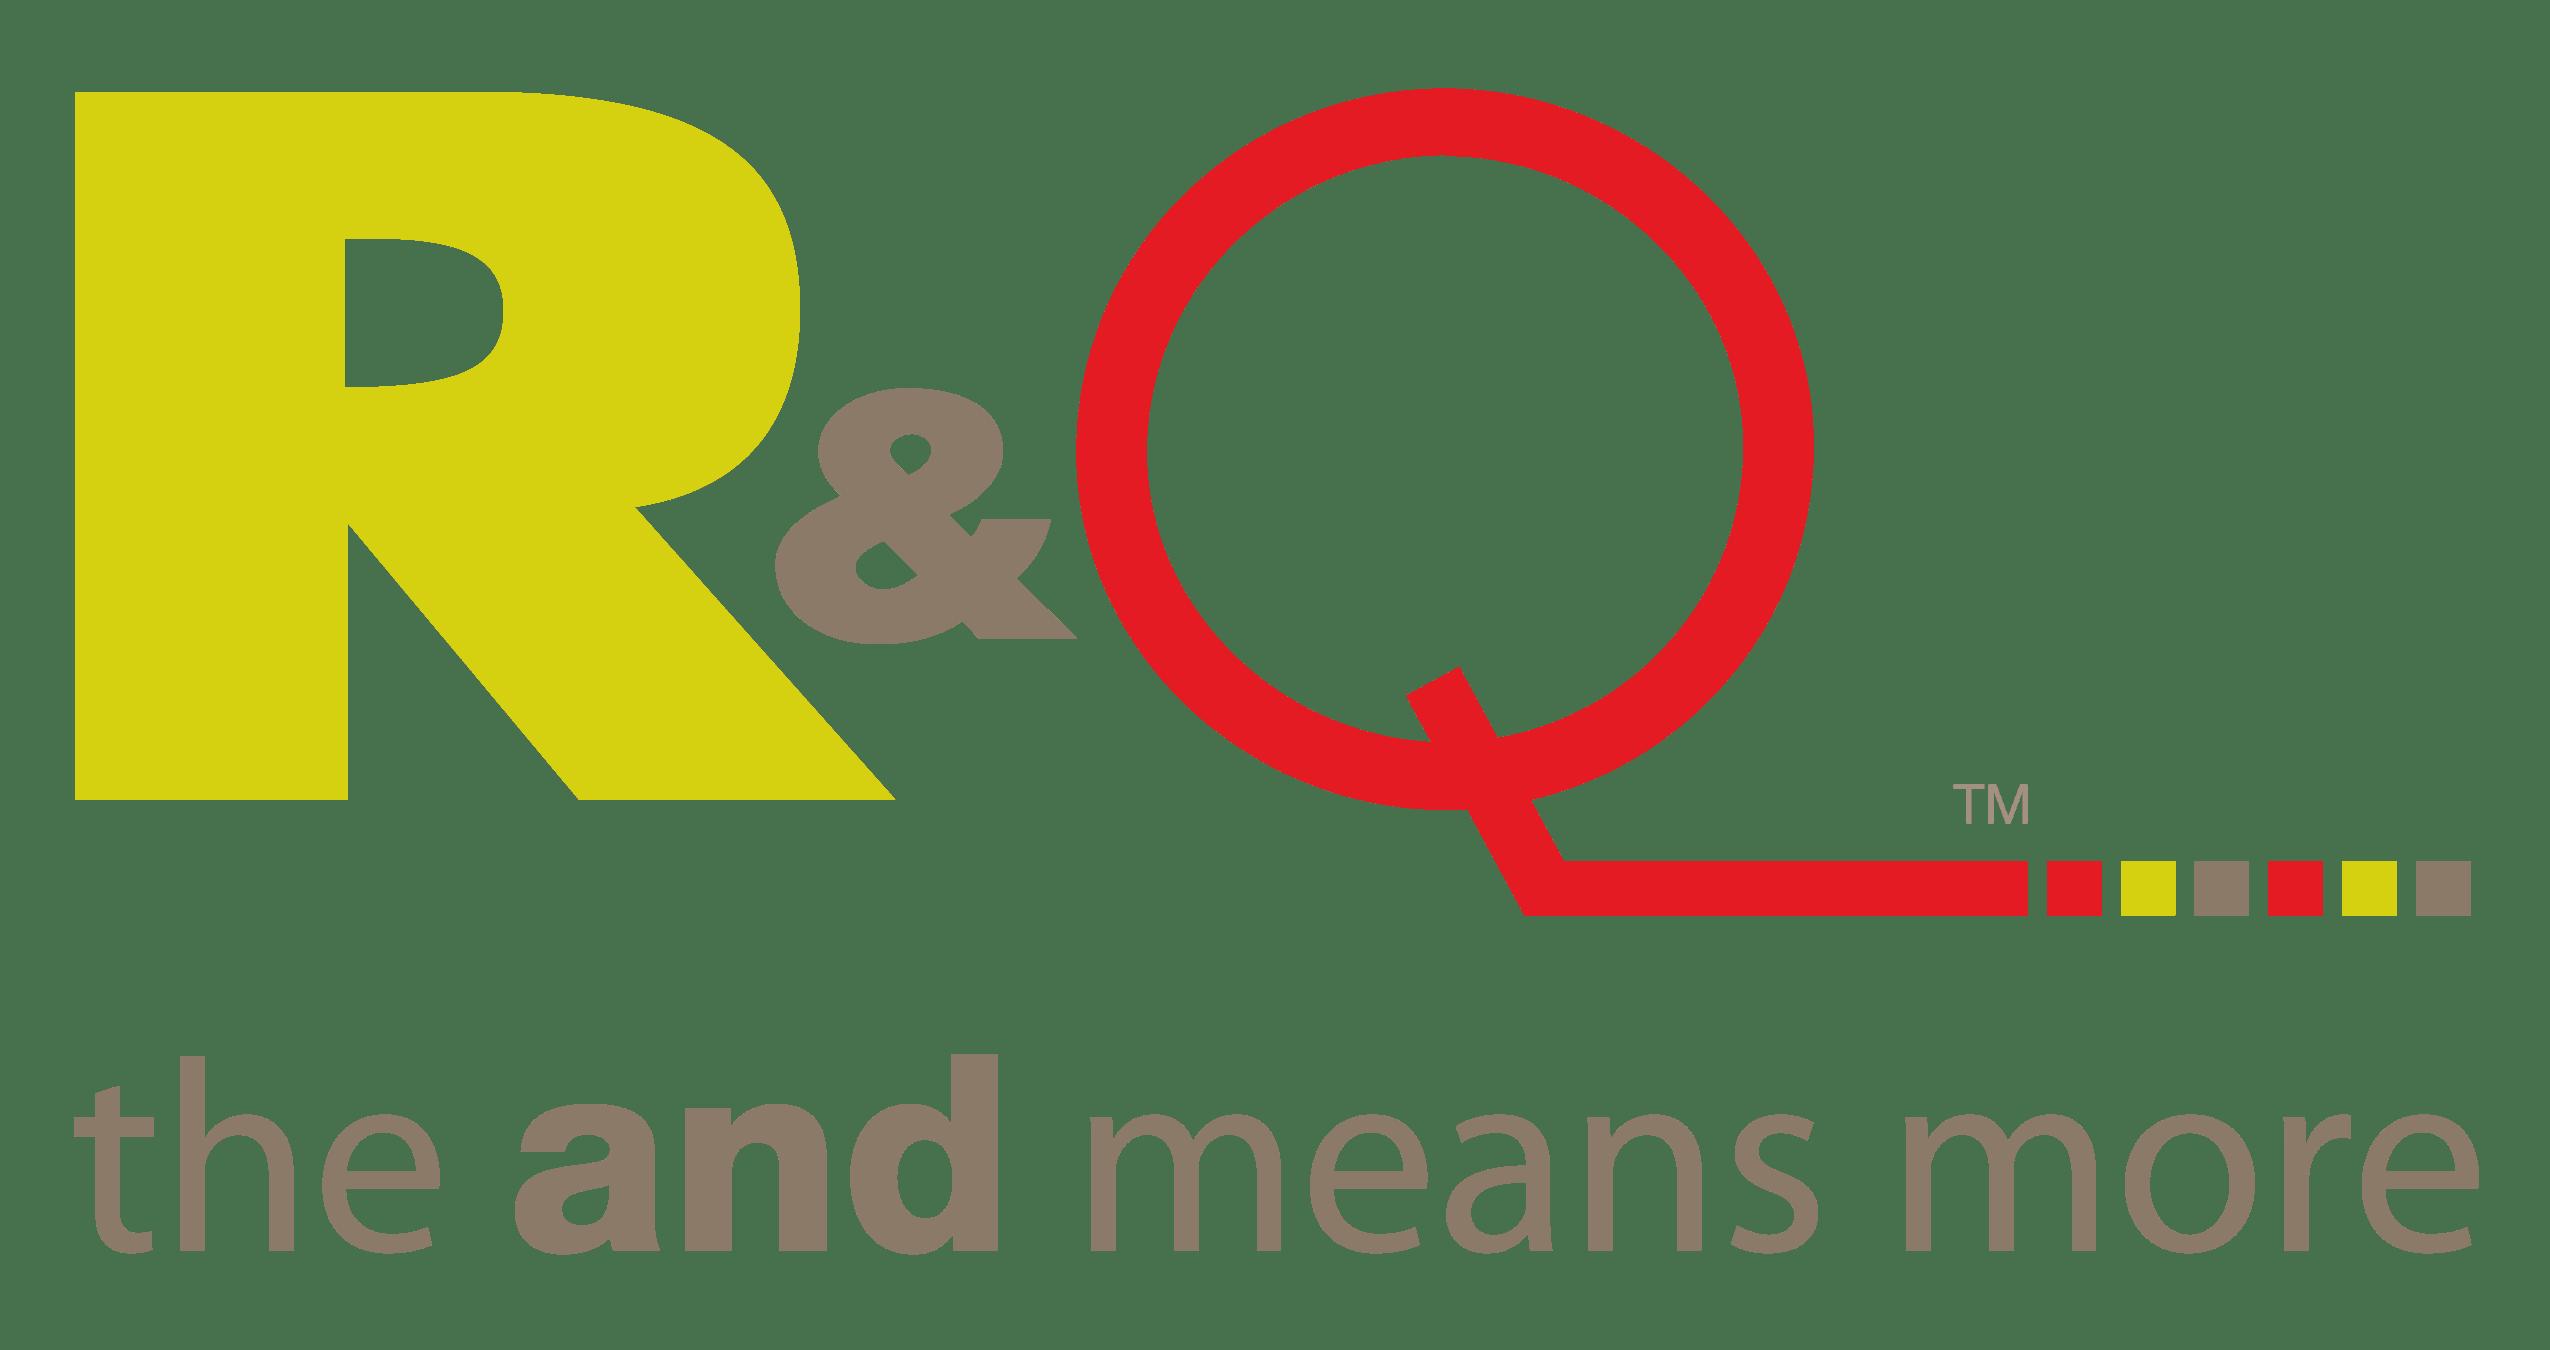 rq_logo.png